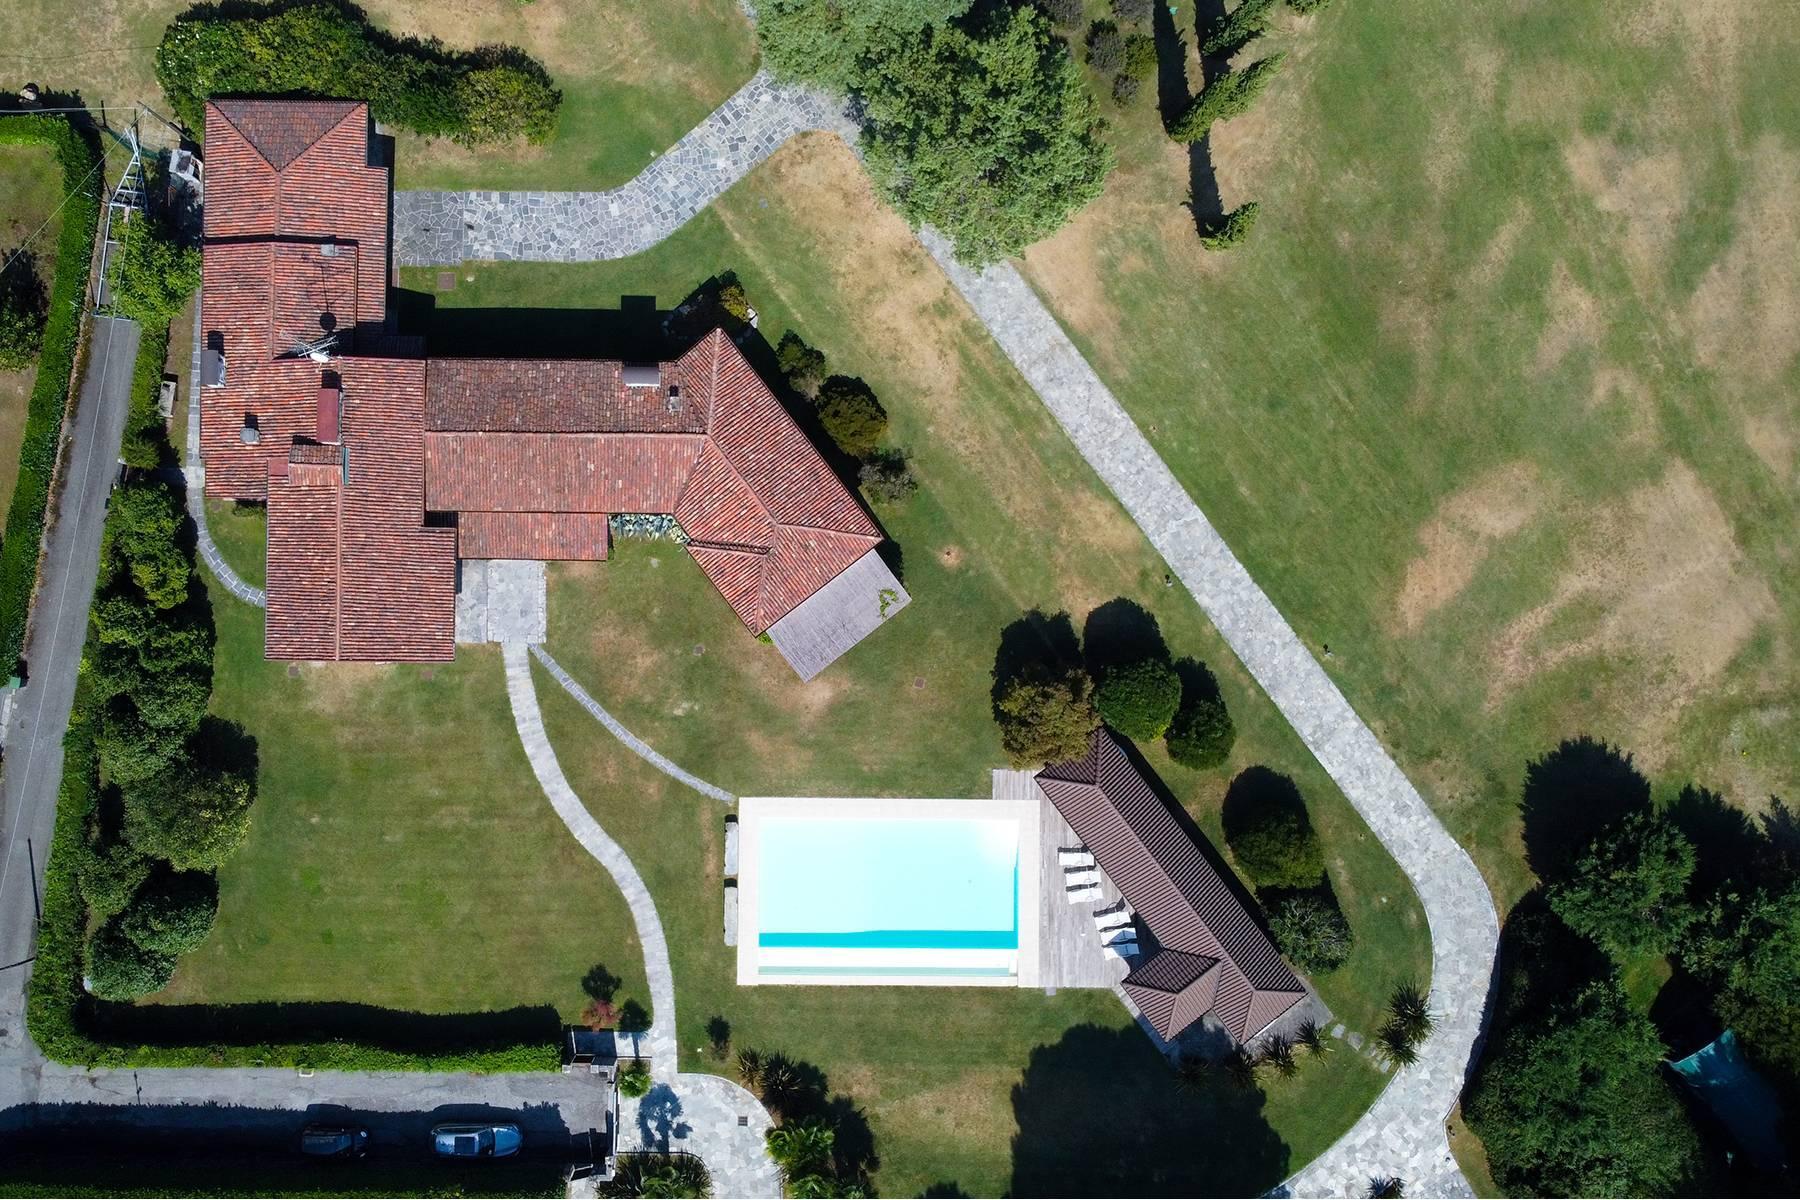 Charmante Villa in Lesa, mitten in der Natur - 43